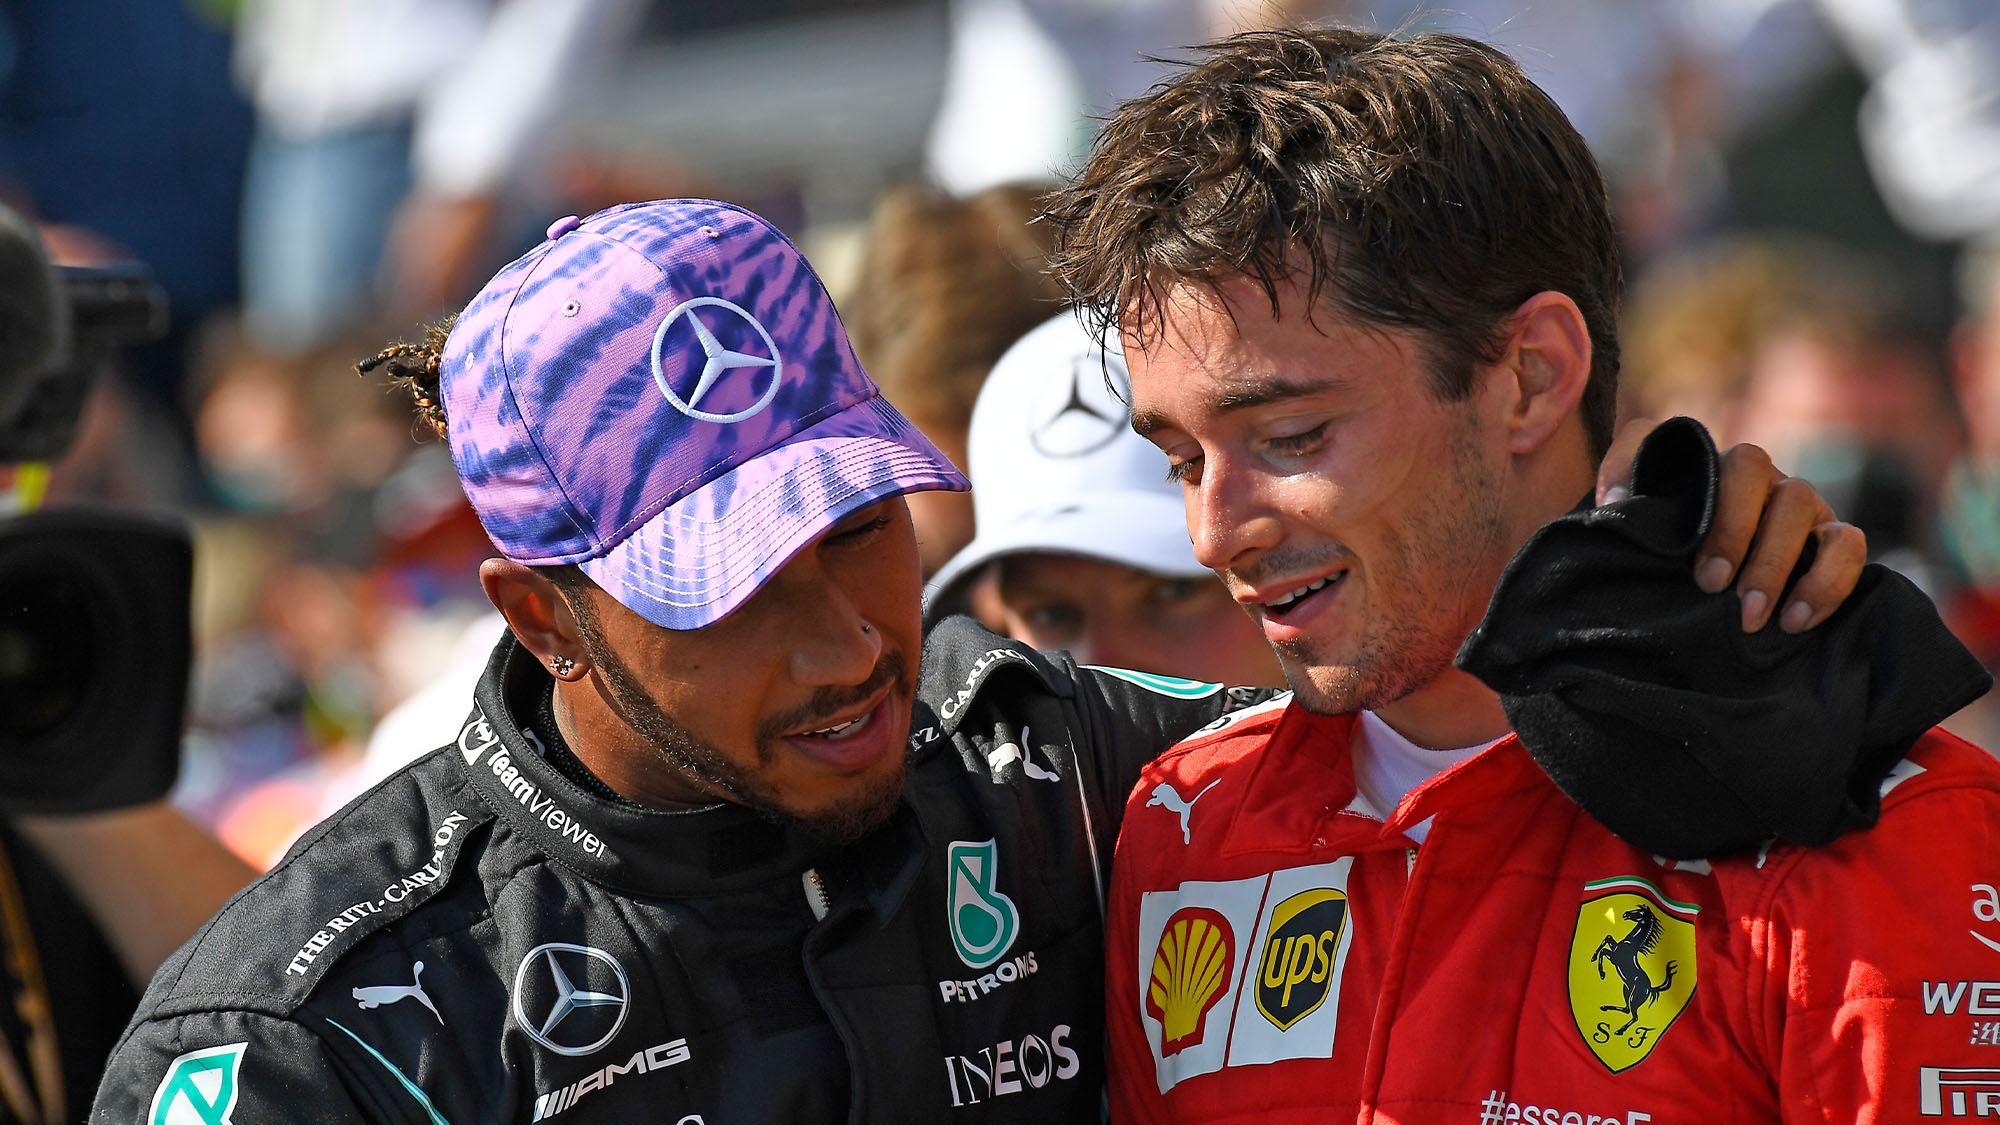 Lewis Hamilton (Mercedes) and Charles Leclerc (Ferrari) after the 2021 British Grand Prix at Silverstone. Photo: Grand Prix Photo